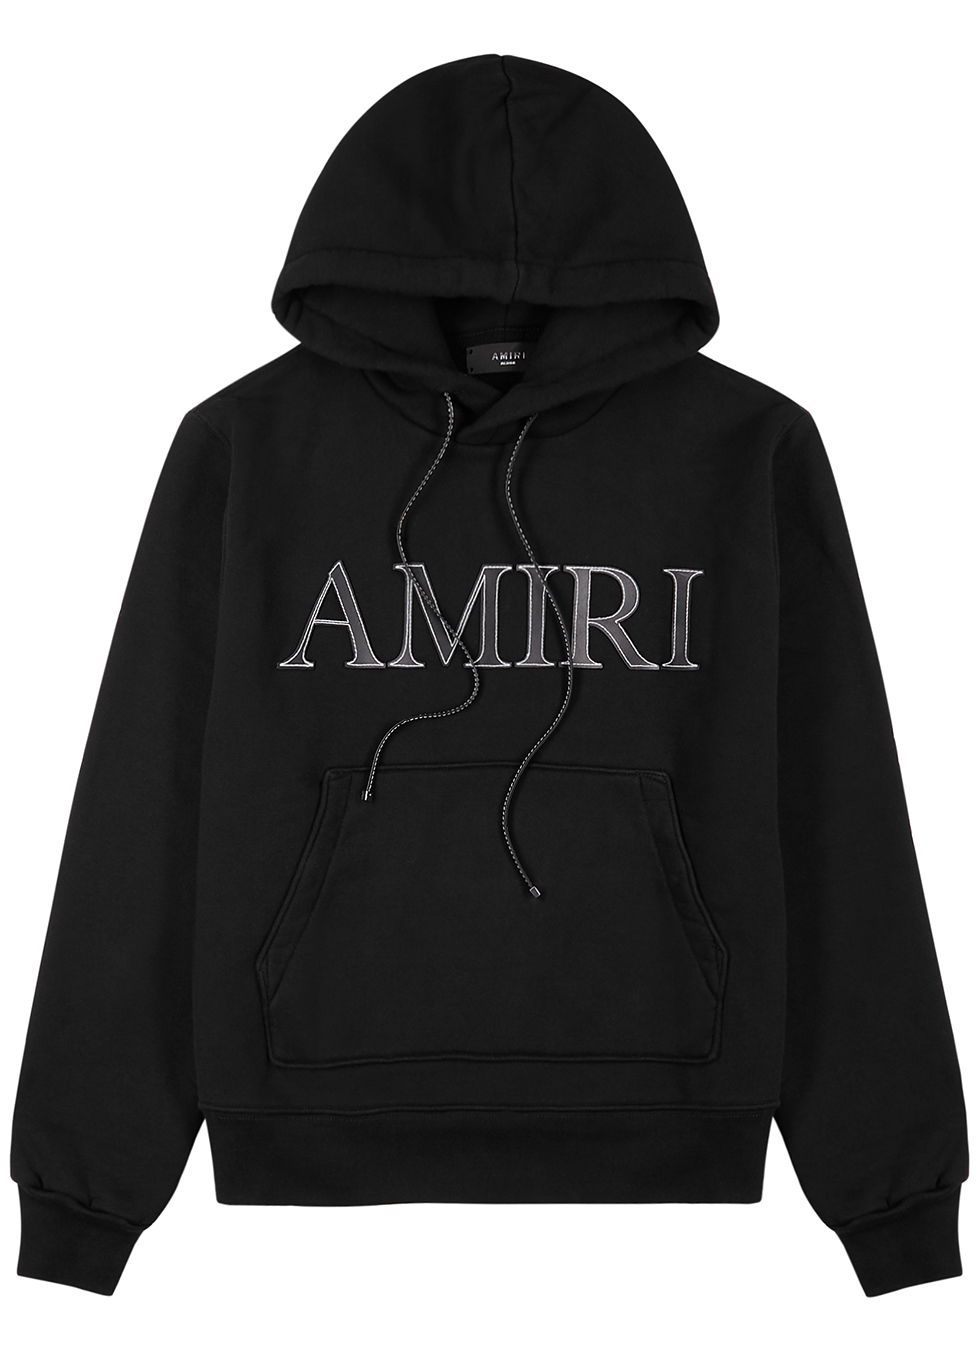 AMIRI distressed effect Logo Hoodie